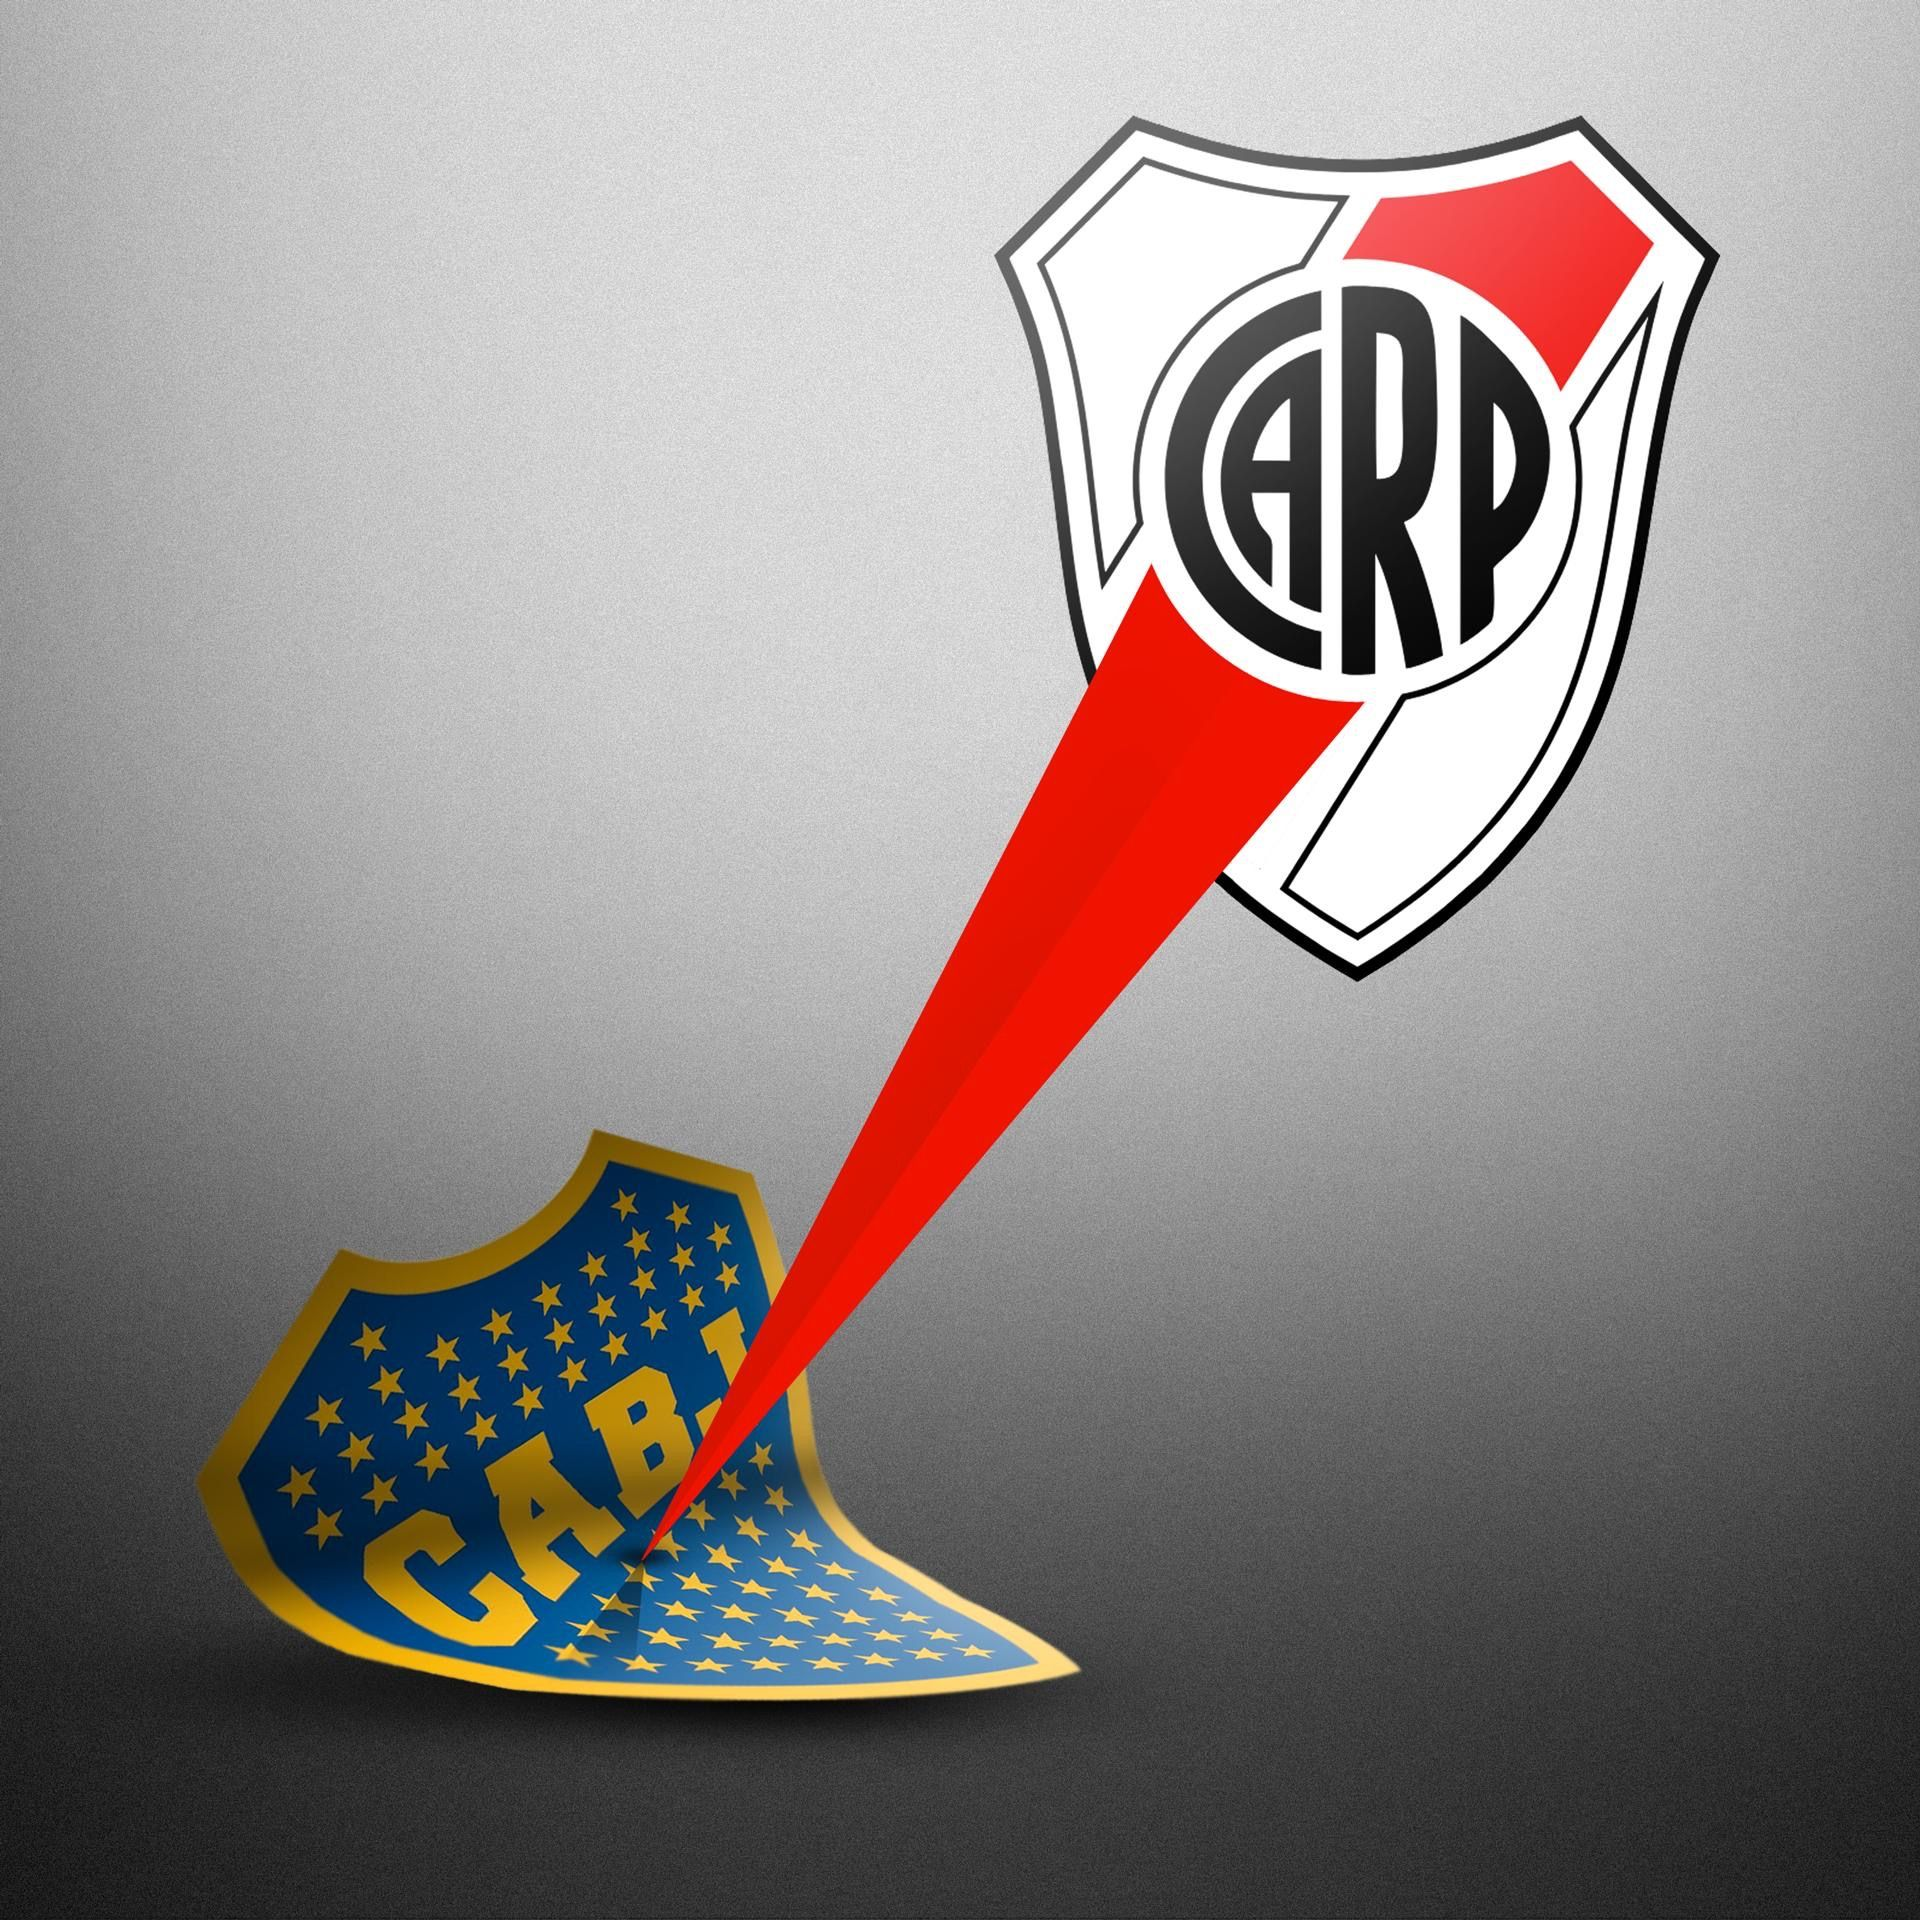 Copa Libertadores Semifinal 2019 Riverplate 2 0 Bocajuniors Caricature Imagenes De River Plate Fondos De River Plate Cargadas A Boca